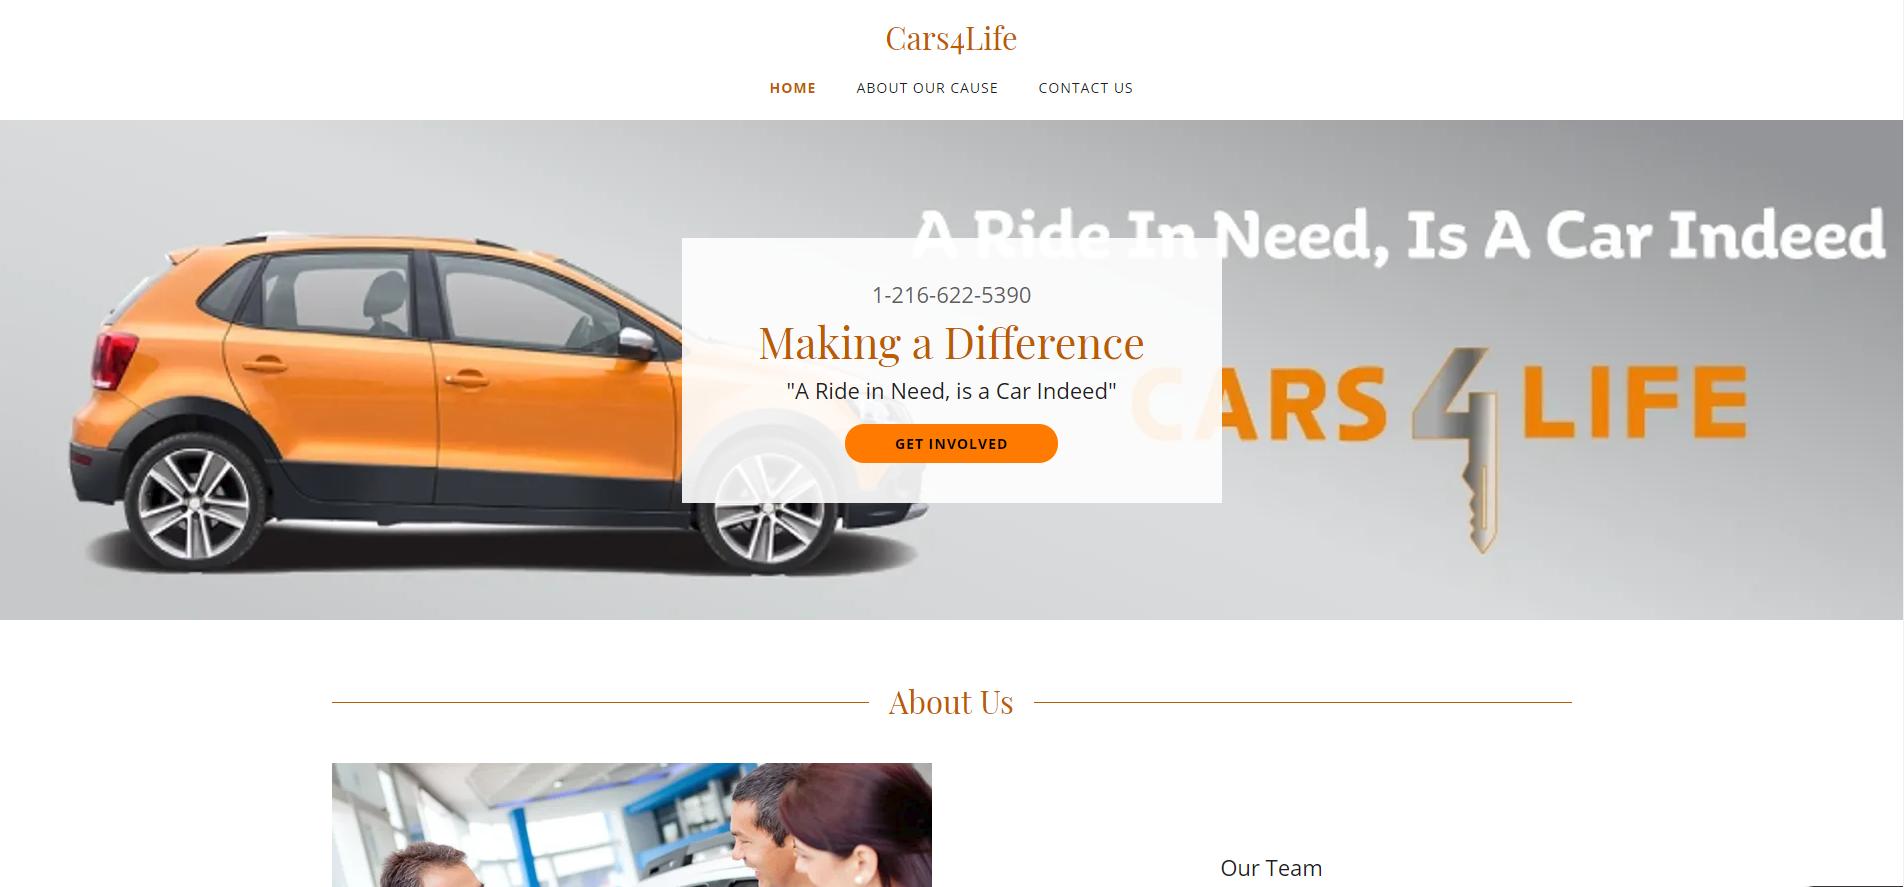 CARS4LIFE